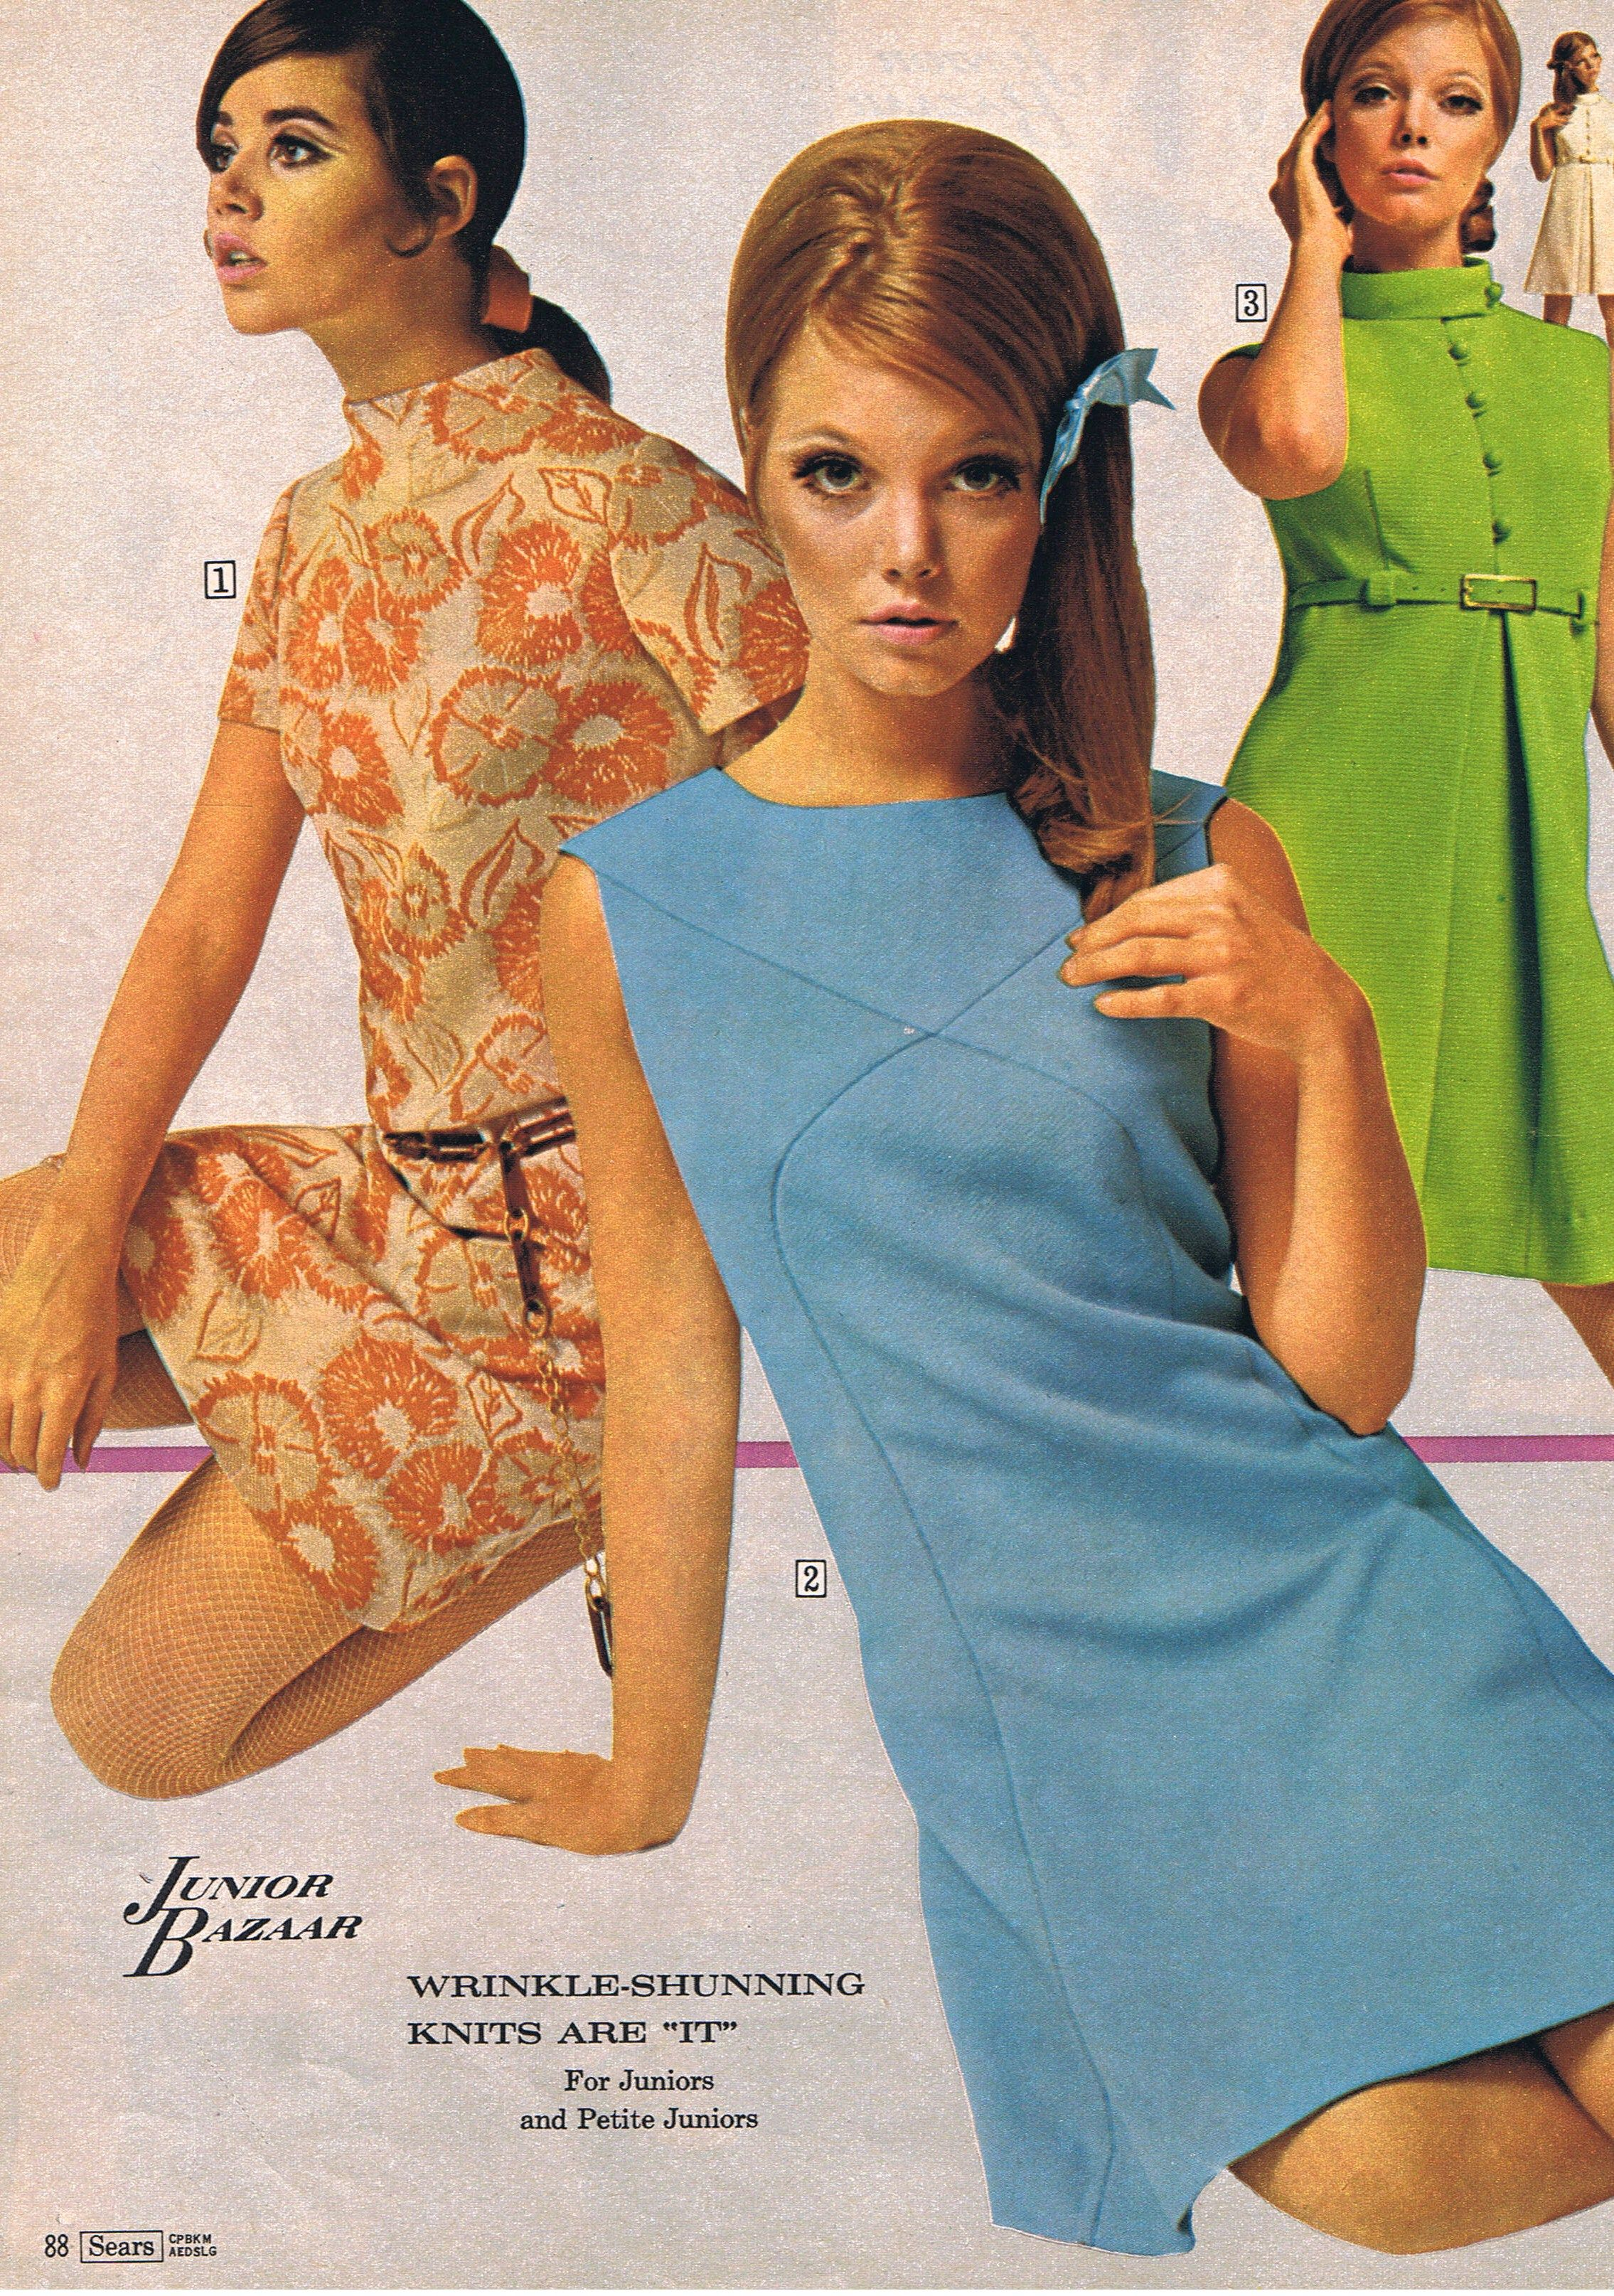 e95f4c22870dd Late 60s simple shift dress mini above knee blue orang floral green solid  print ad models magazine Vintage Fashion  Sears catalog Junior Bazaar